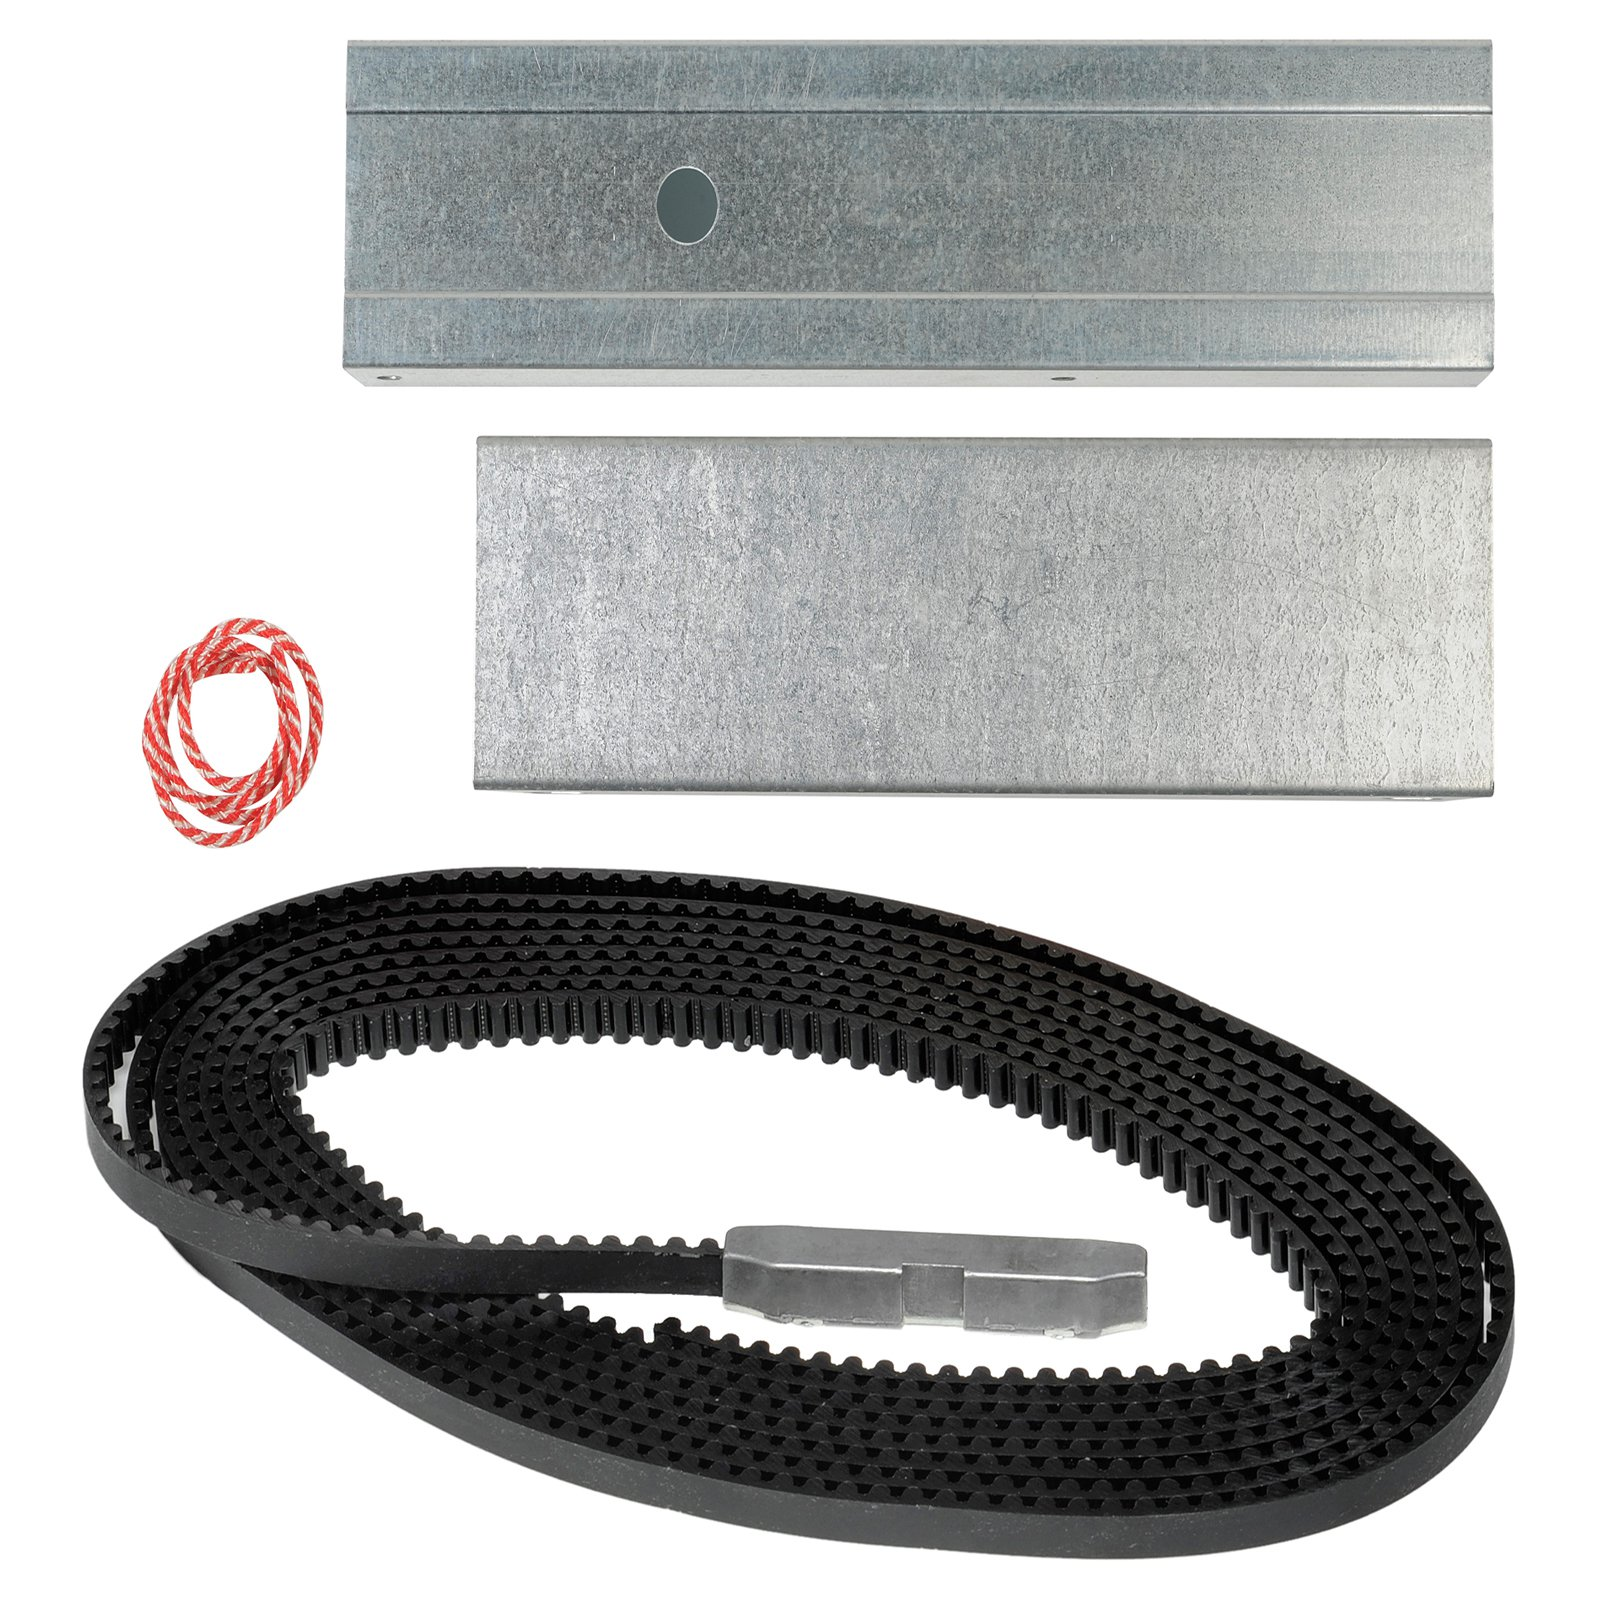 Genie 37302r C-Channel Belt Extension Kit by Genie